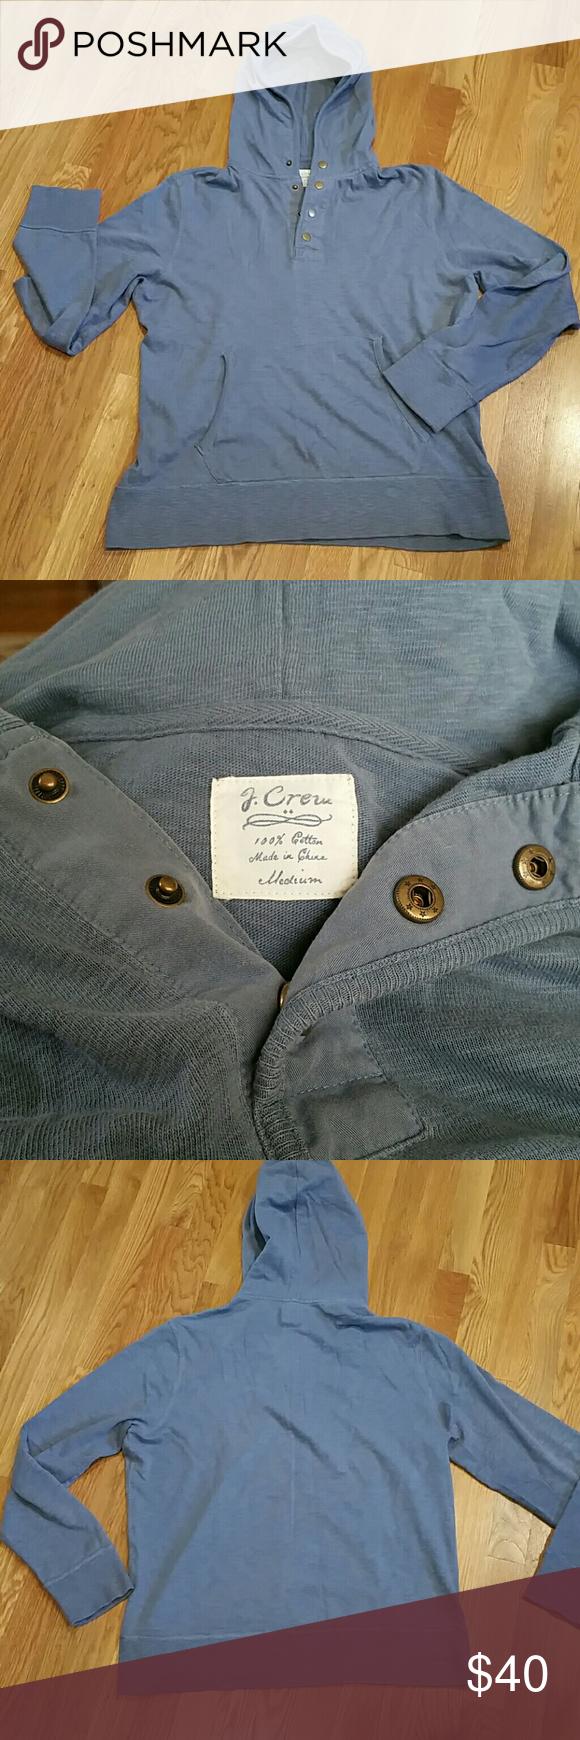 J Crew Hoodie (Mens) J. Crew Hoodie.   Size Medium.   100% cotton.  1/4 snap hoodie.  Front pocket.   Grry/blue colior. Excellent condition. J. Crew Shirts Sweatshirts & Hoodies